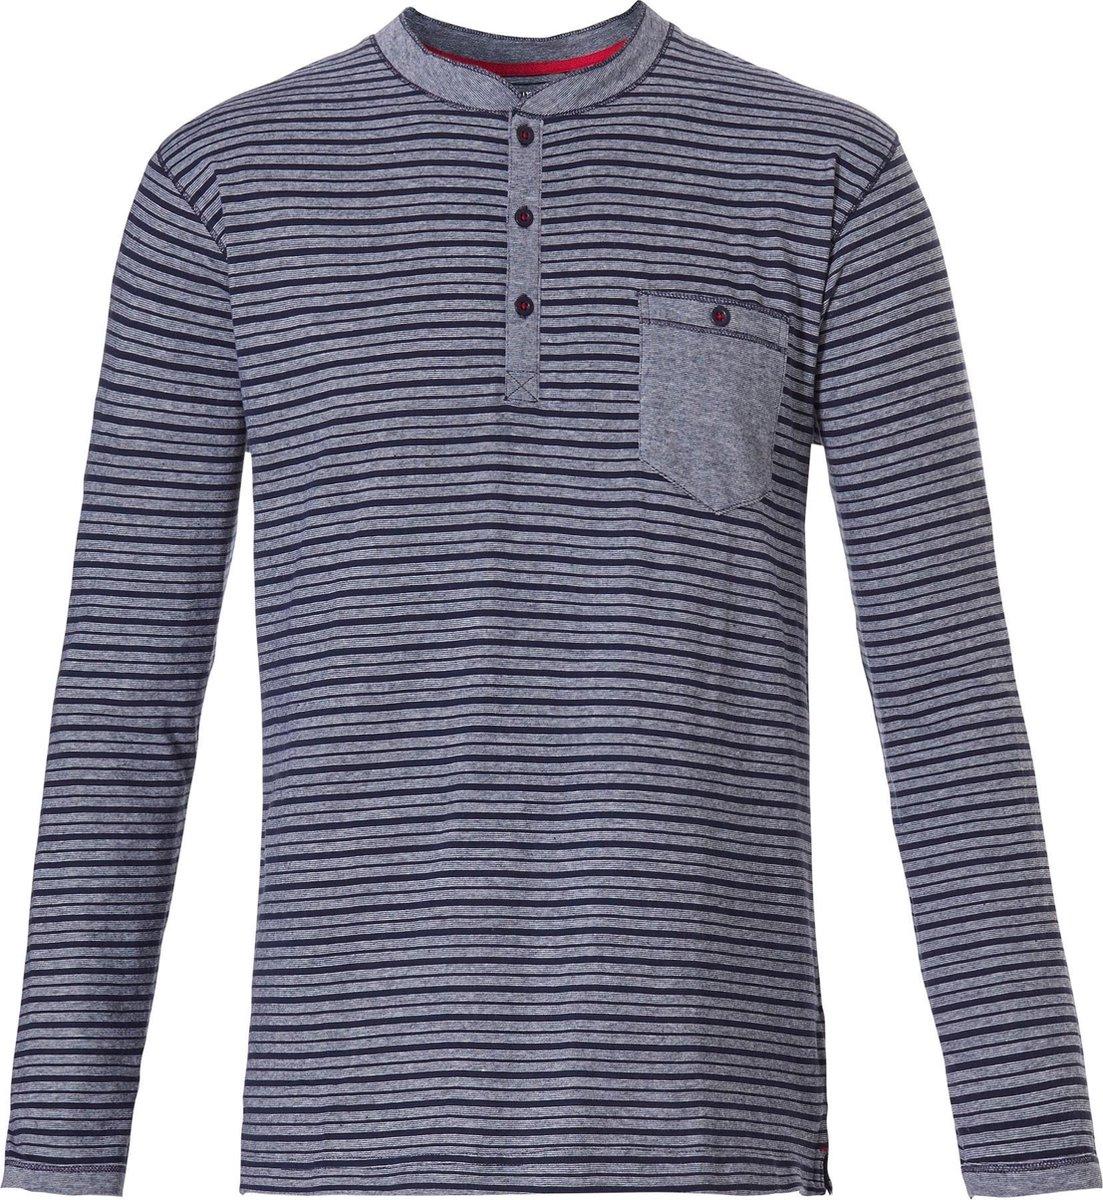 Pastunette heren pyjama Mix and Match 623 4 XL Blauw